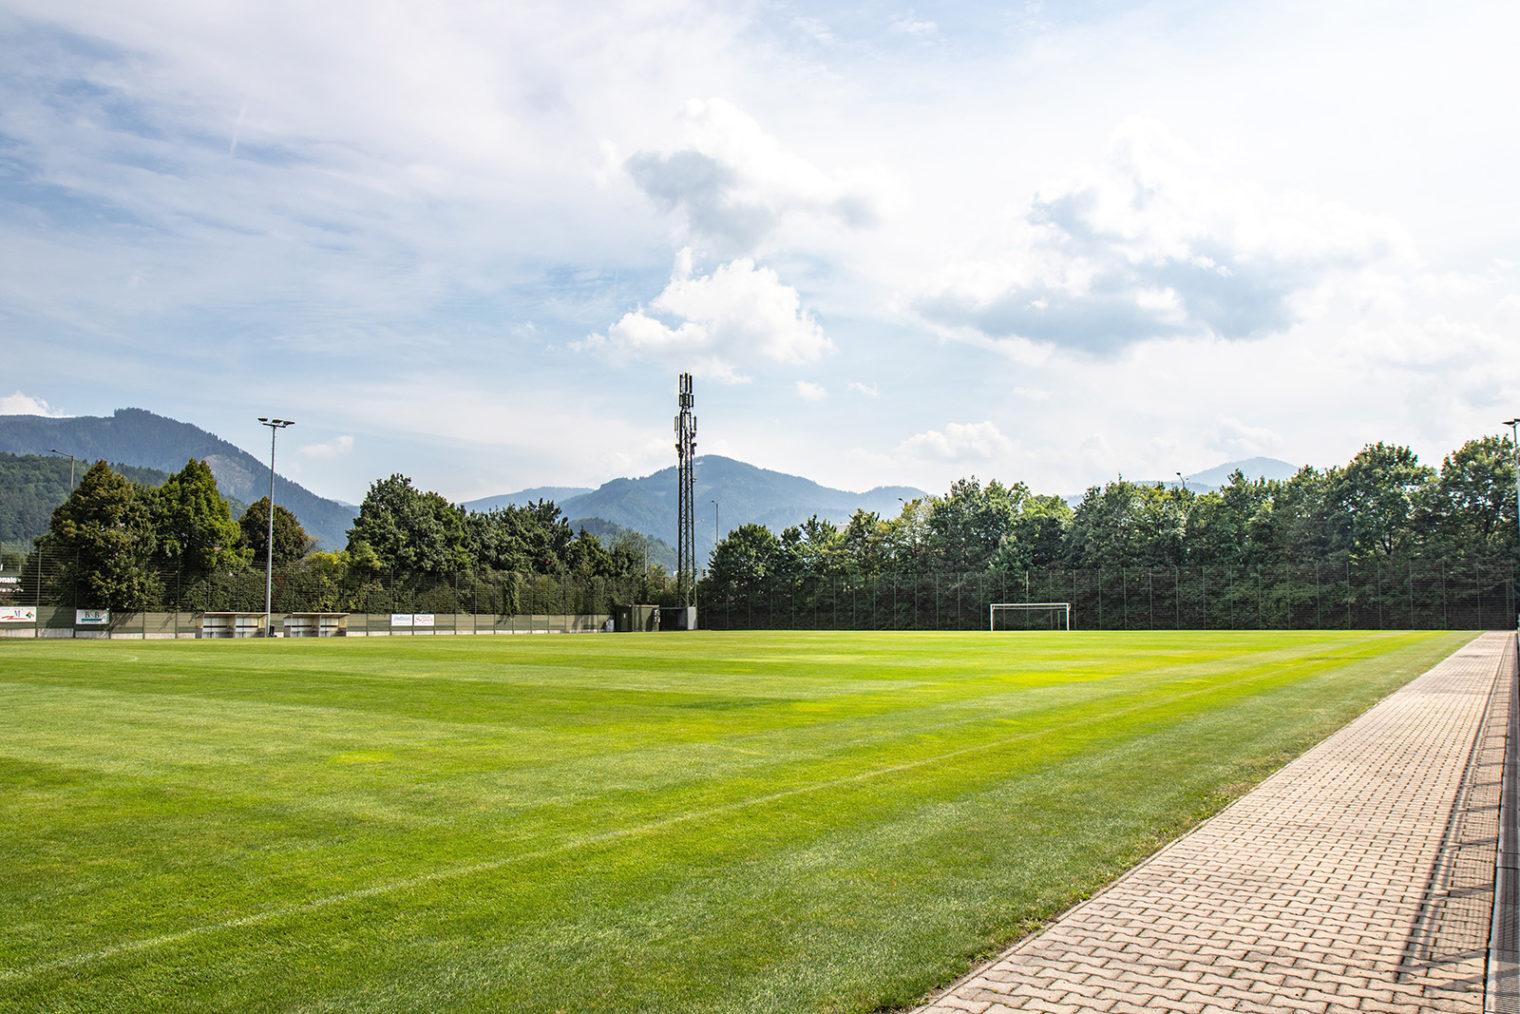 Fußballfeld am Tivoli